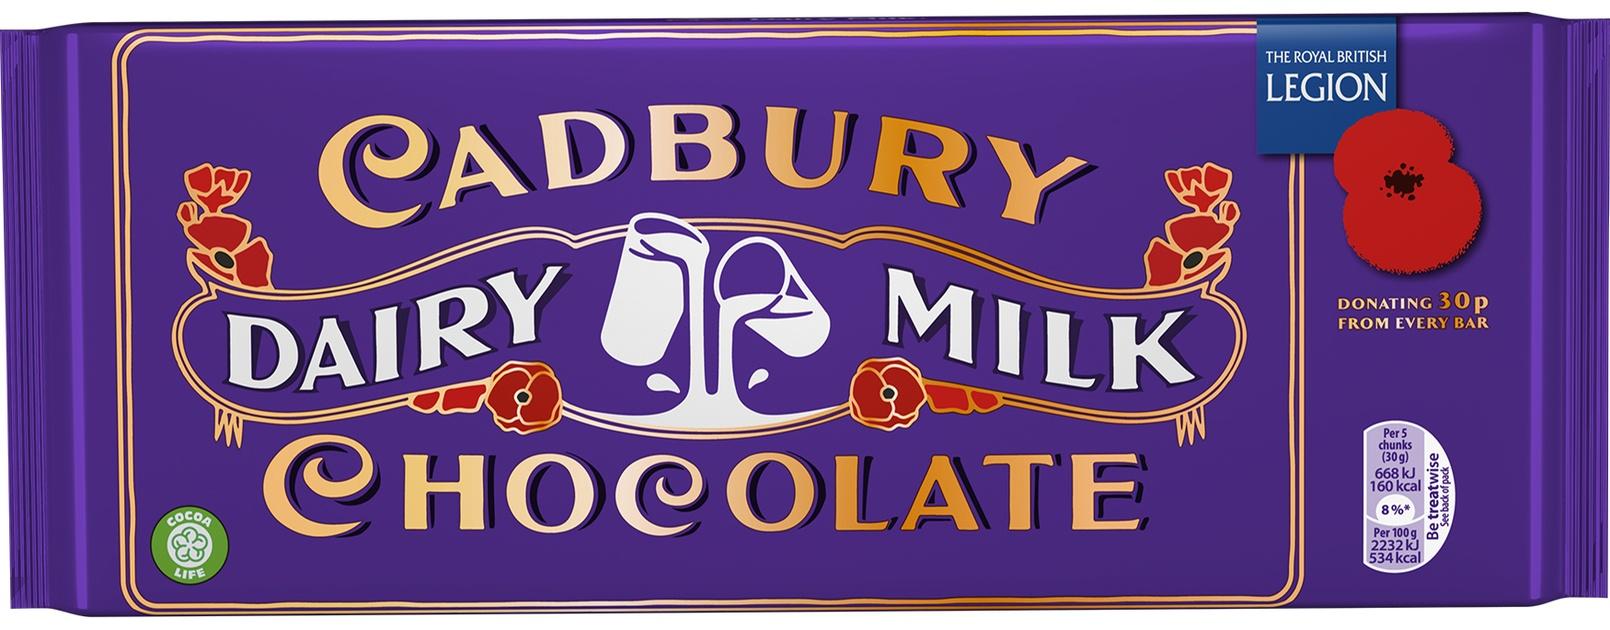 Cadbury_WYS